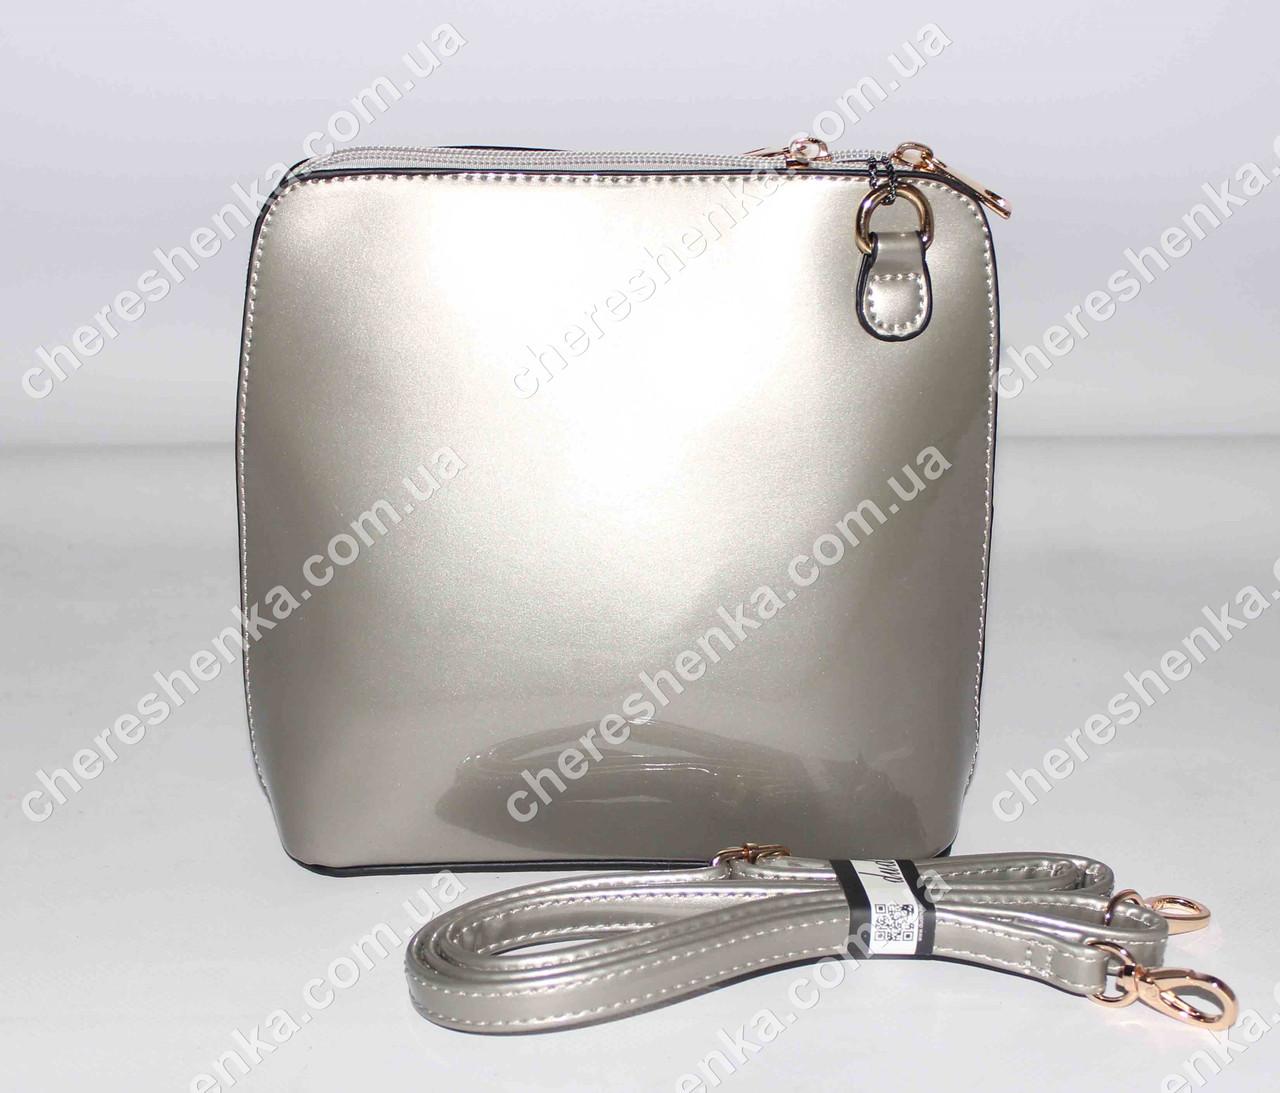 Женская сумочка Dudlin 2060-31